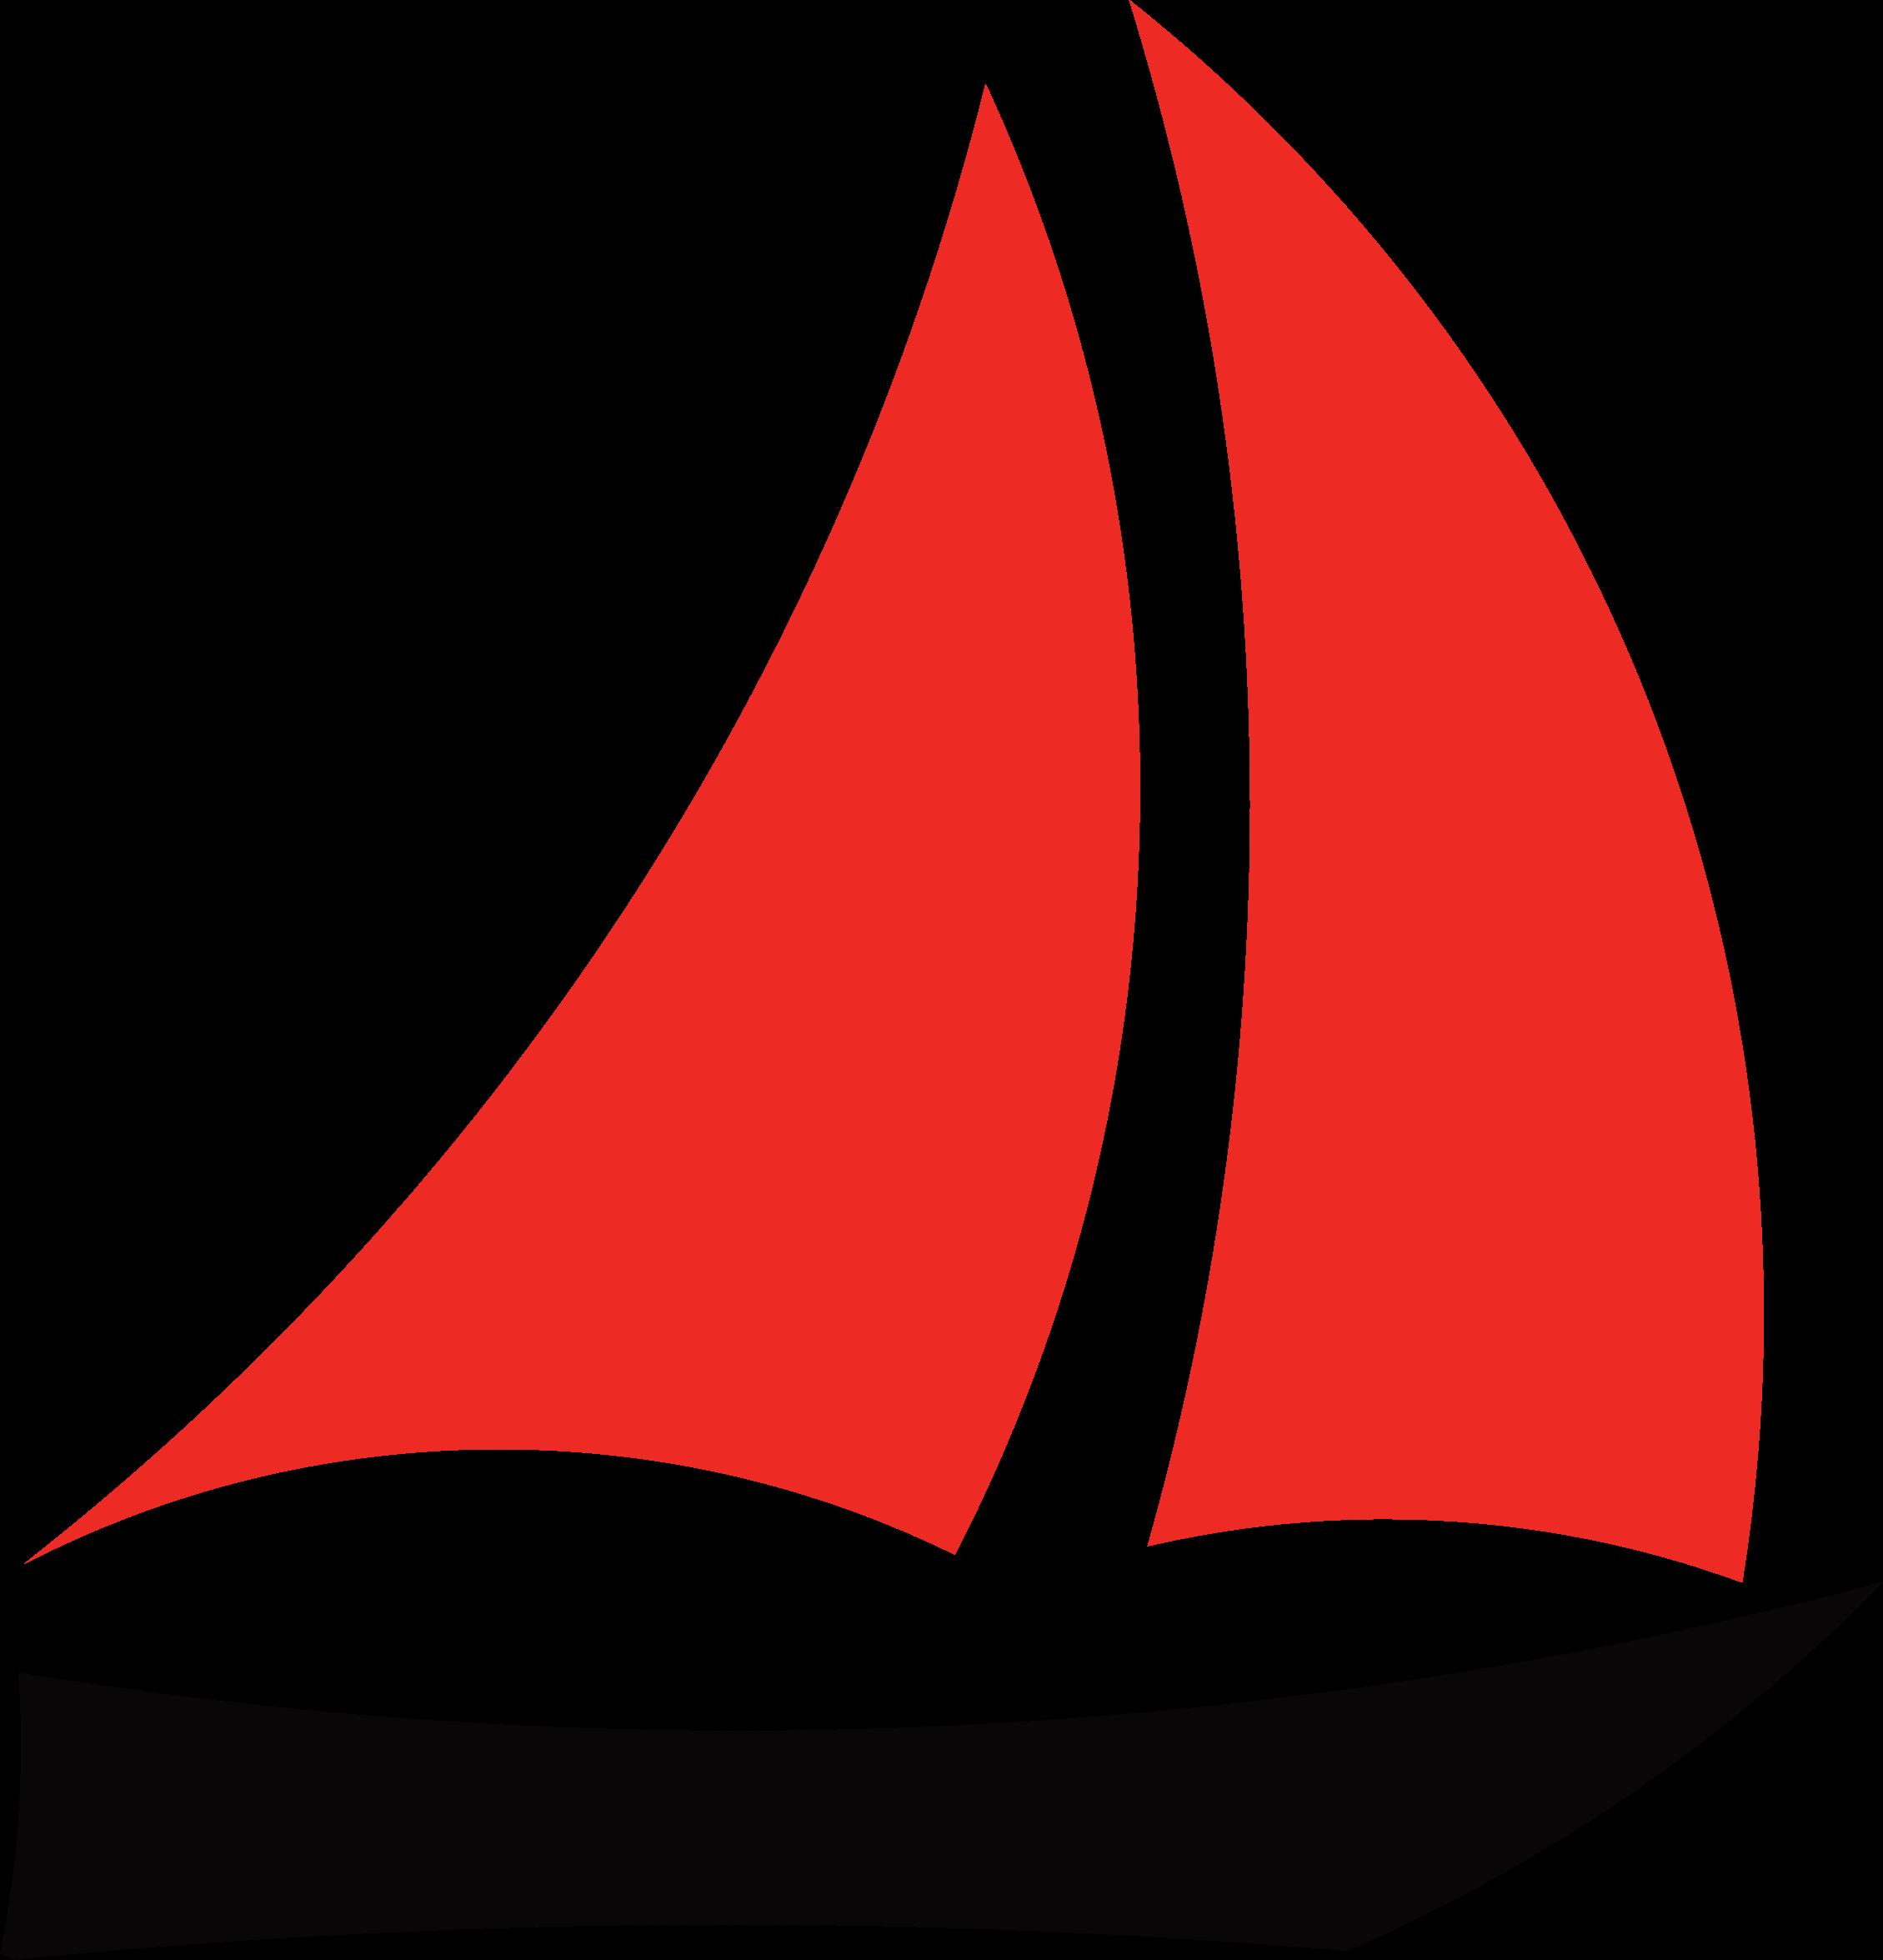 Gridct big image png. Boat clipart logo